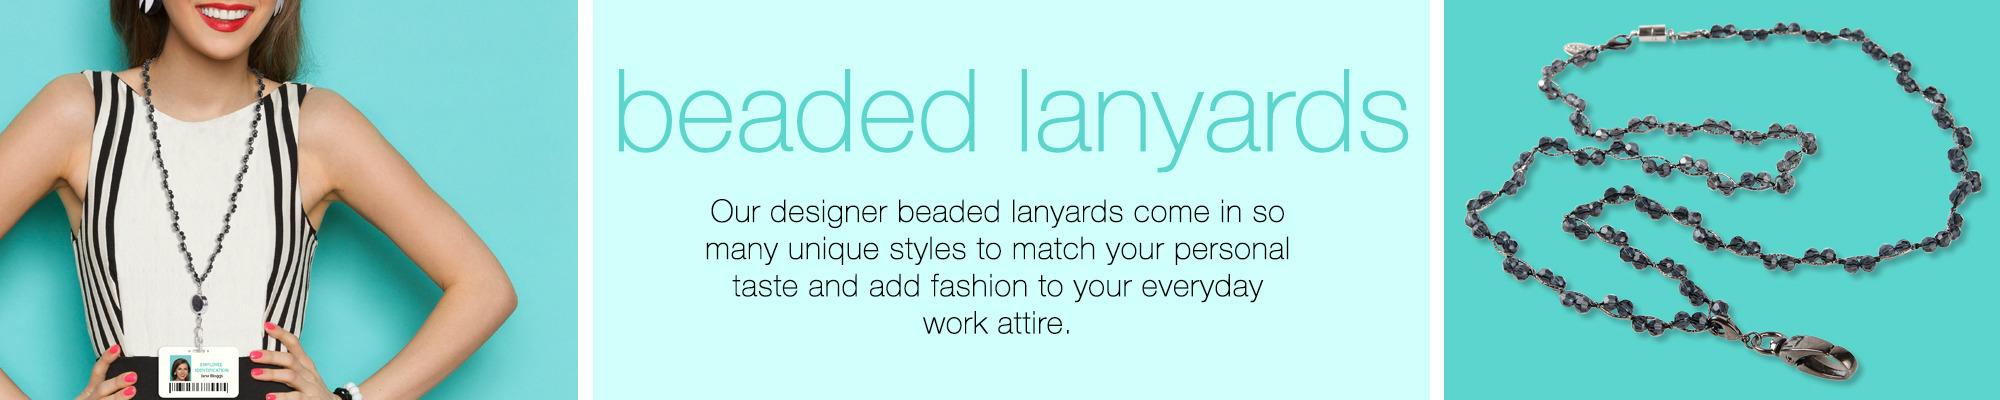 beaded-lanyards-hp-graphic-1-lg.jpg